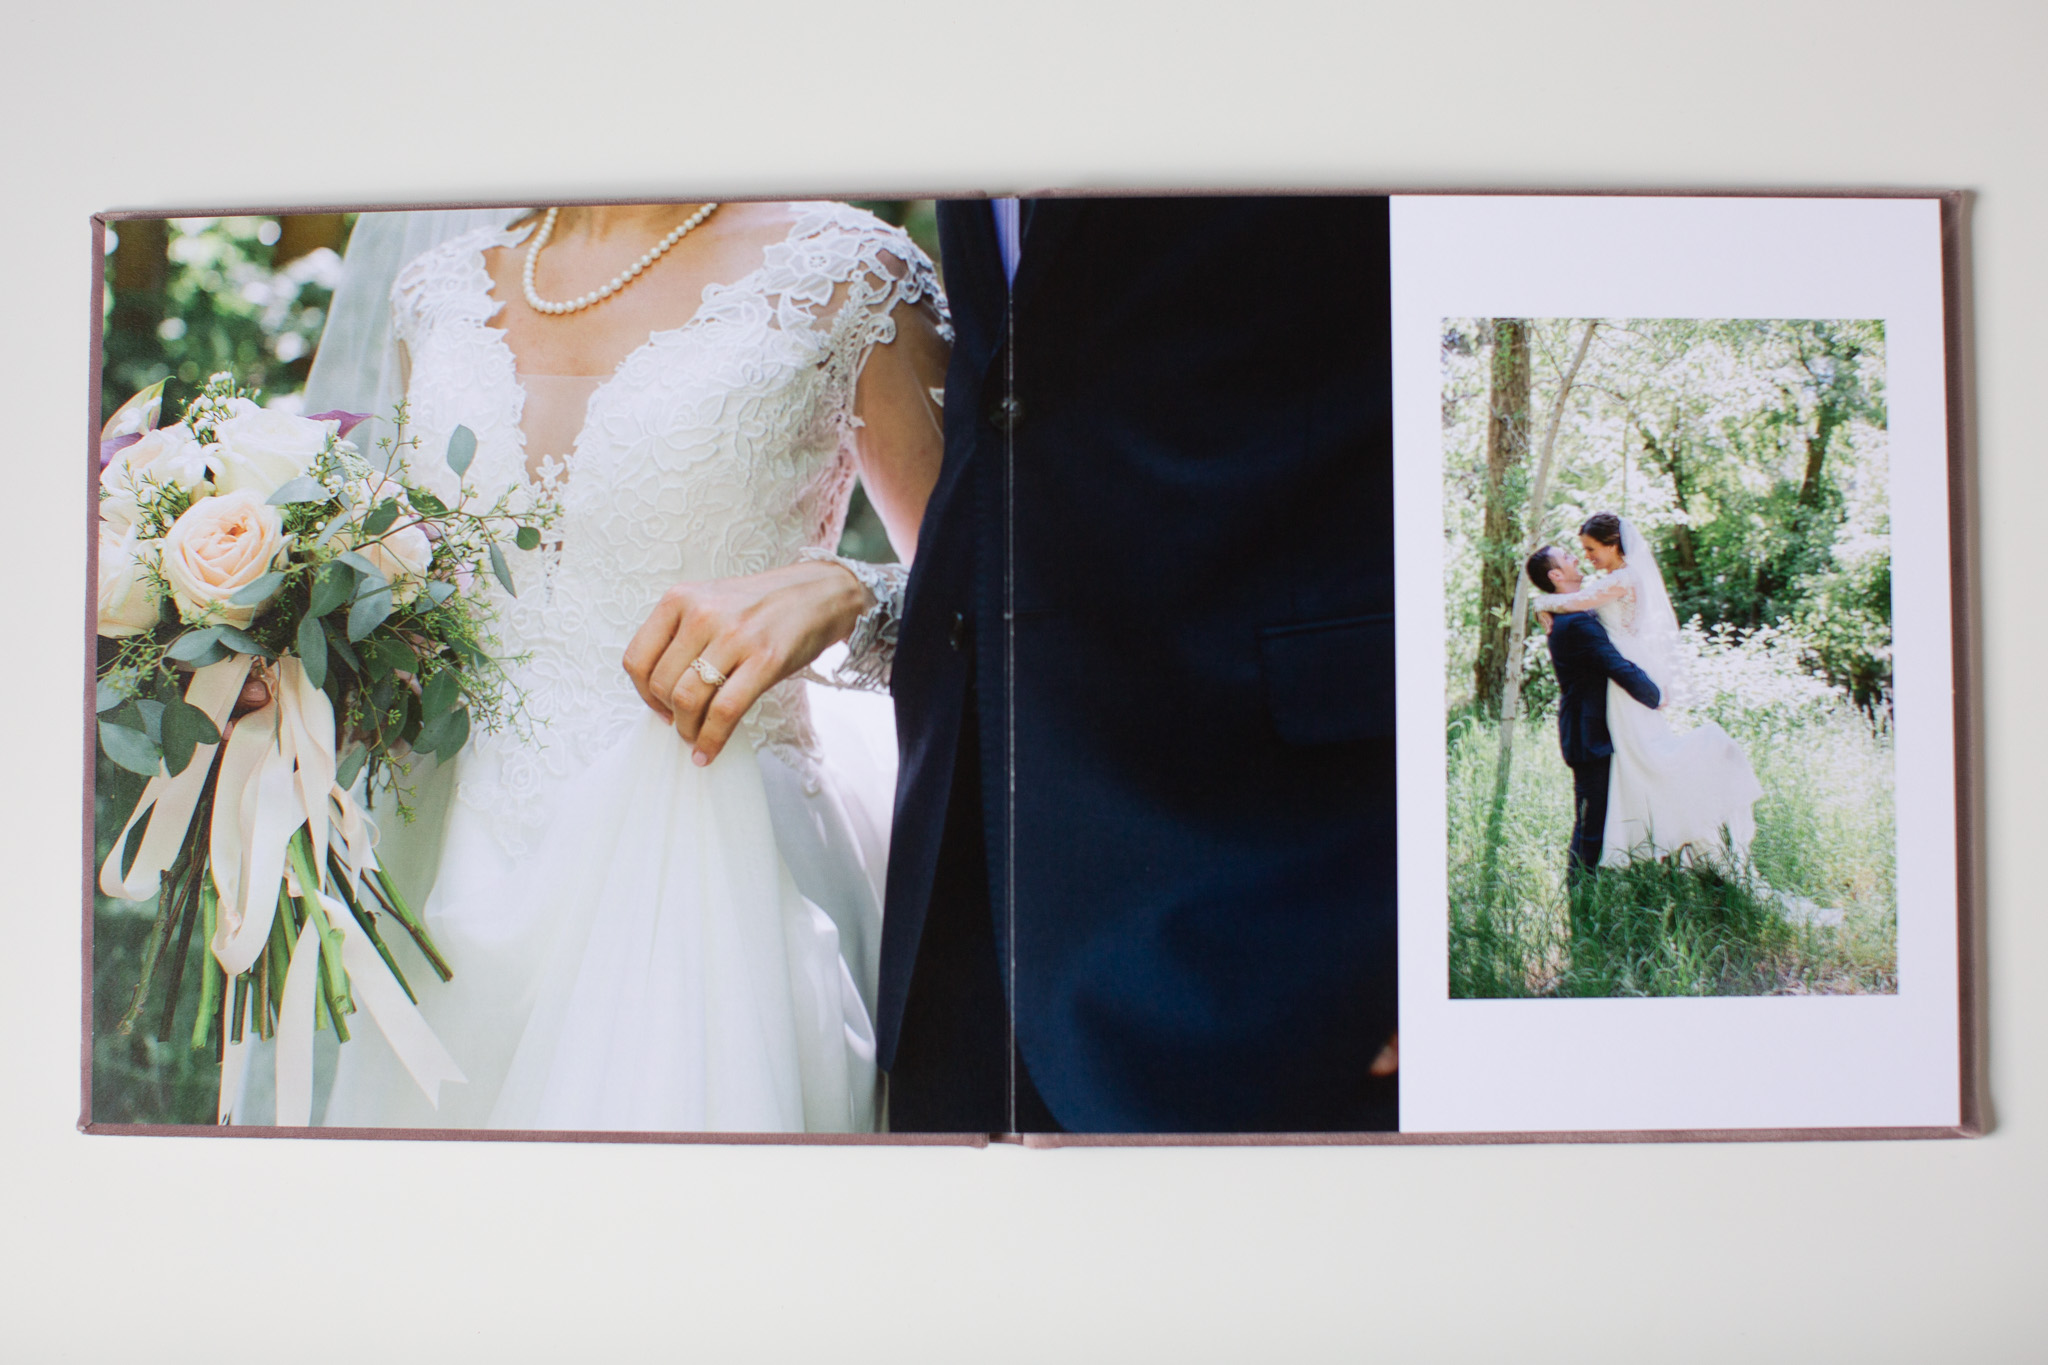 albumsbooks_JTP2019_015.jpg